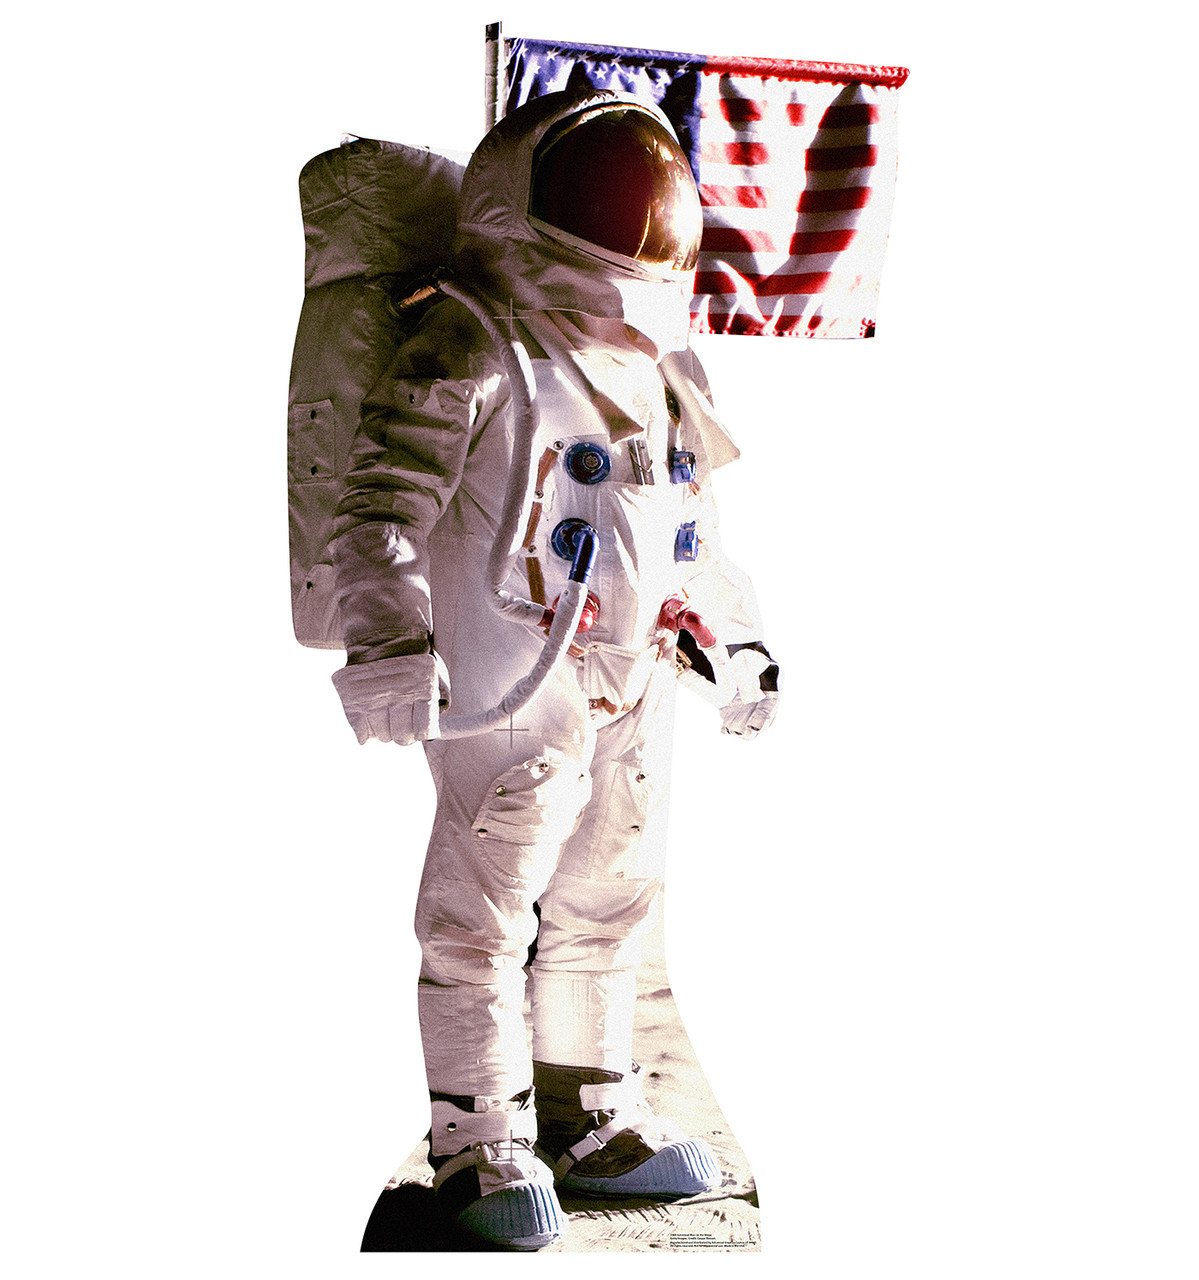 Life-size Astronaut Man on the Moon Cardboard Standup